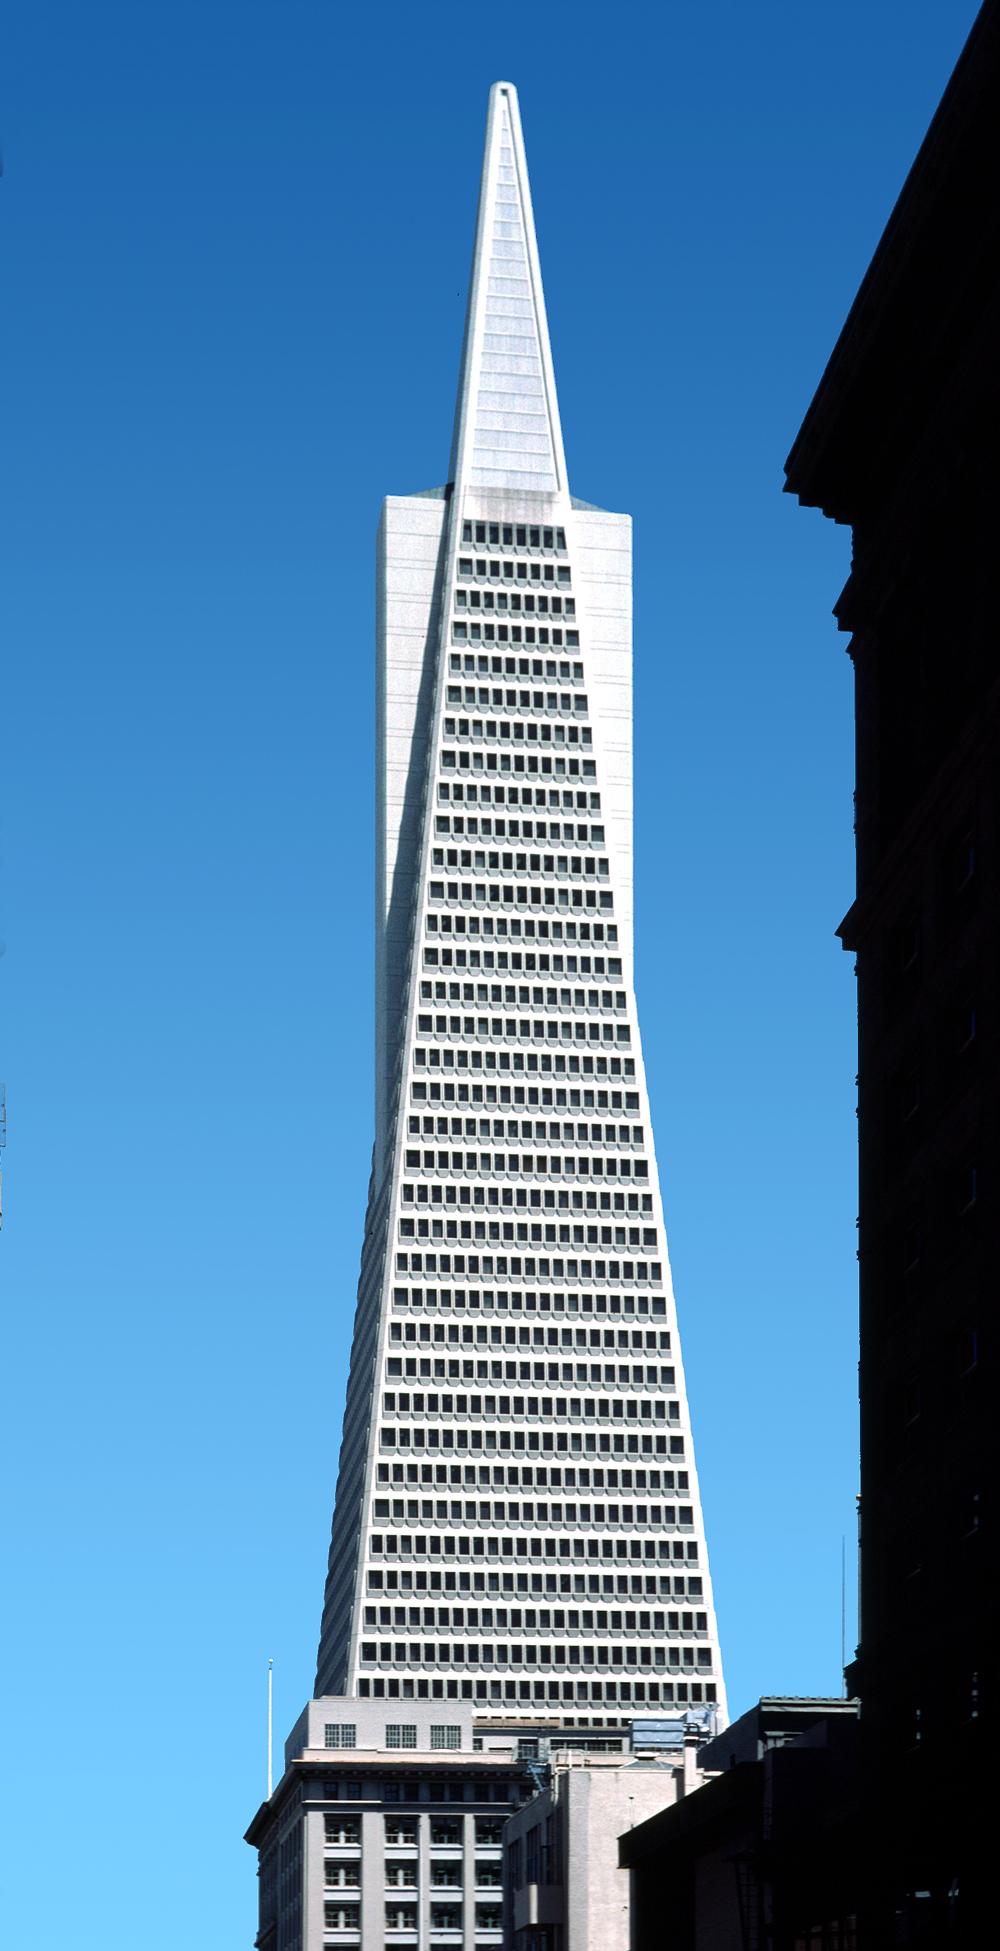 Transamerica Pyramid Center - The Skyscraper Center